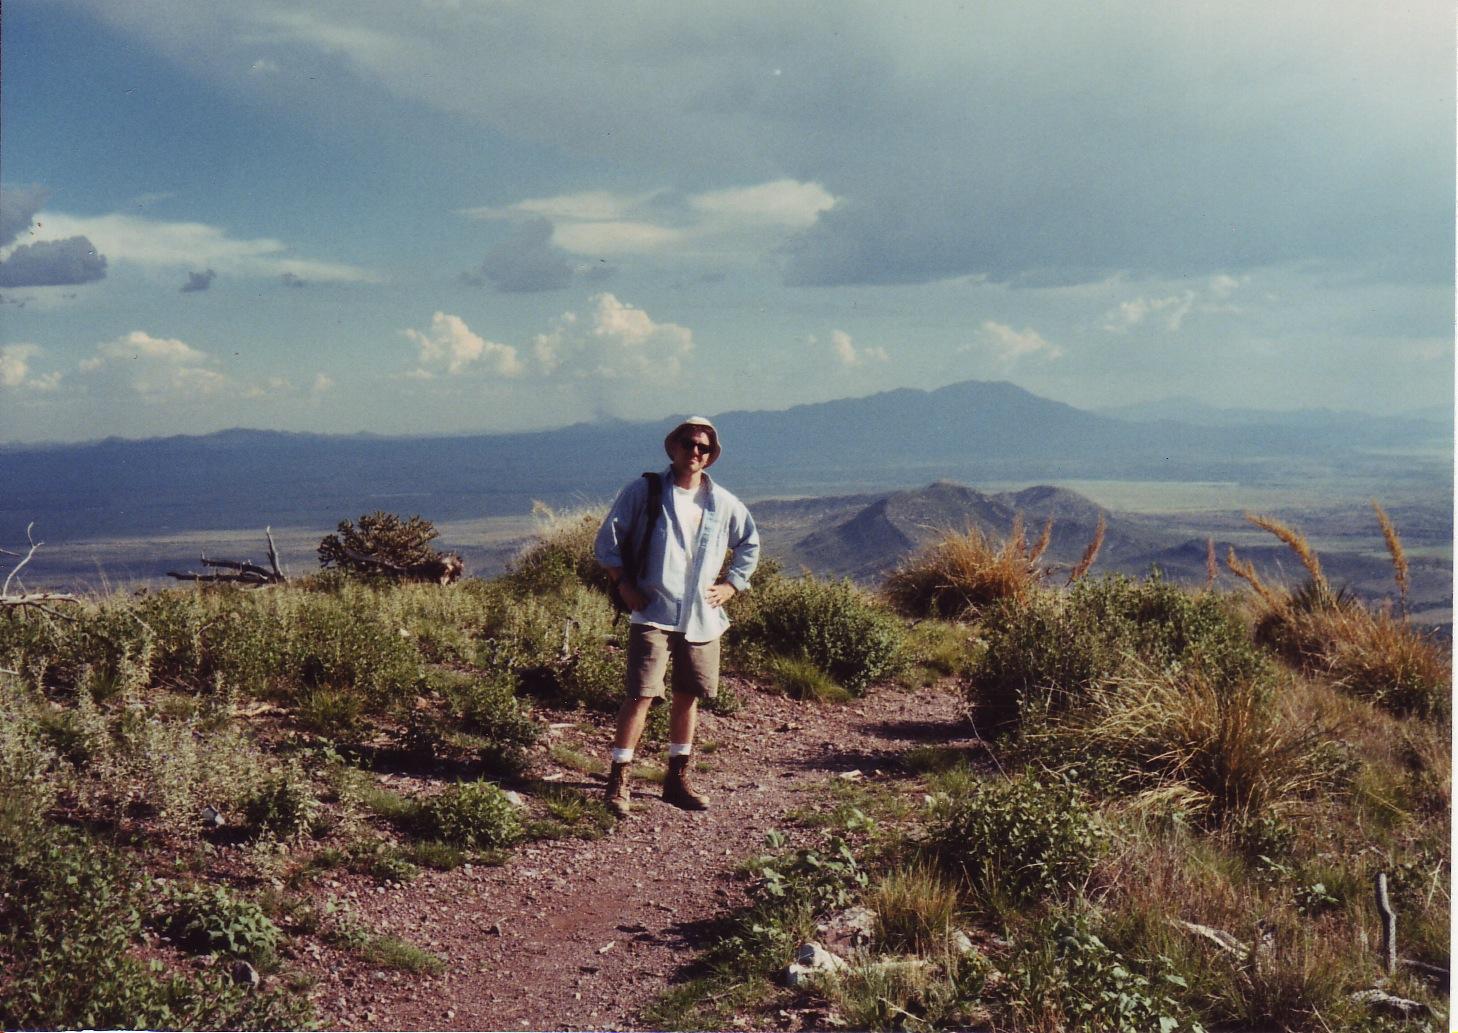 Coronado Mountains, July 1998